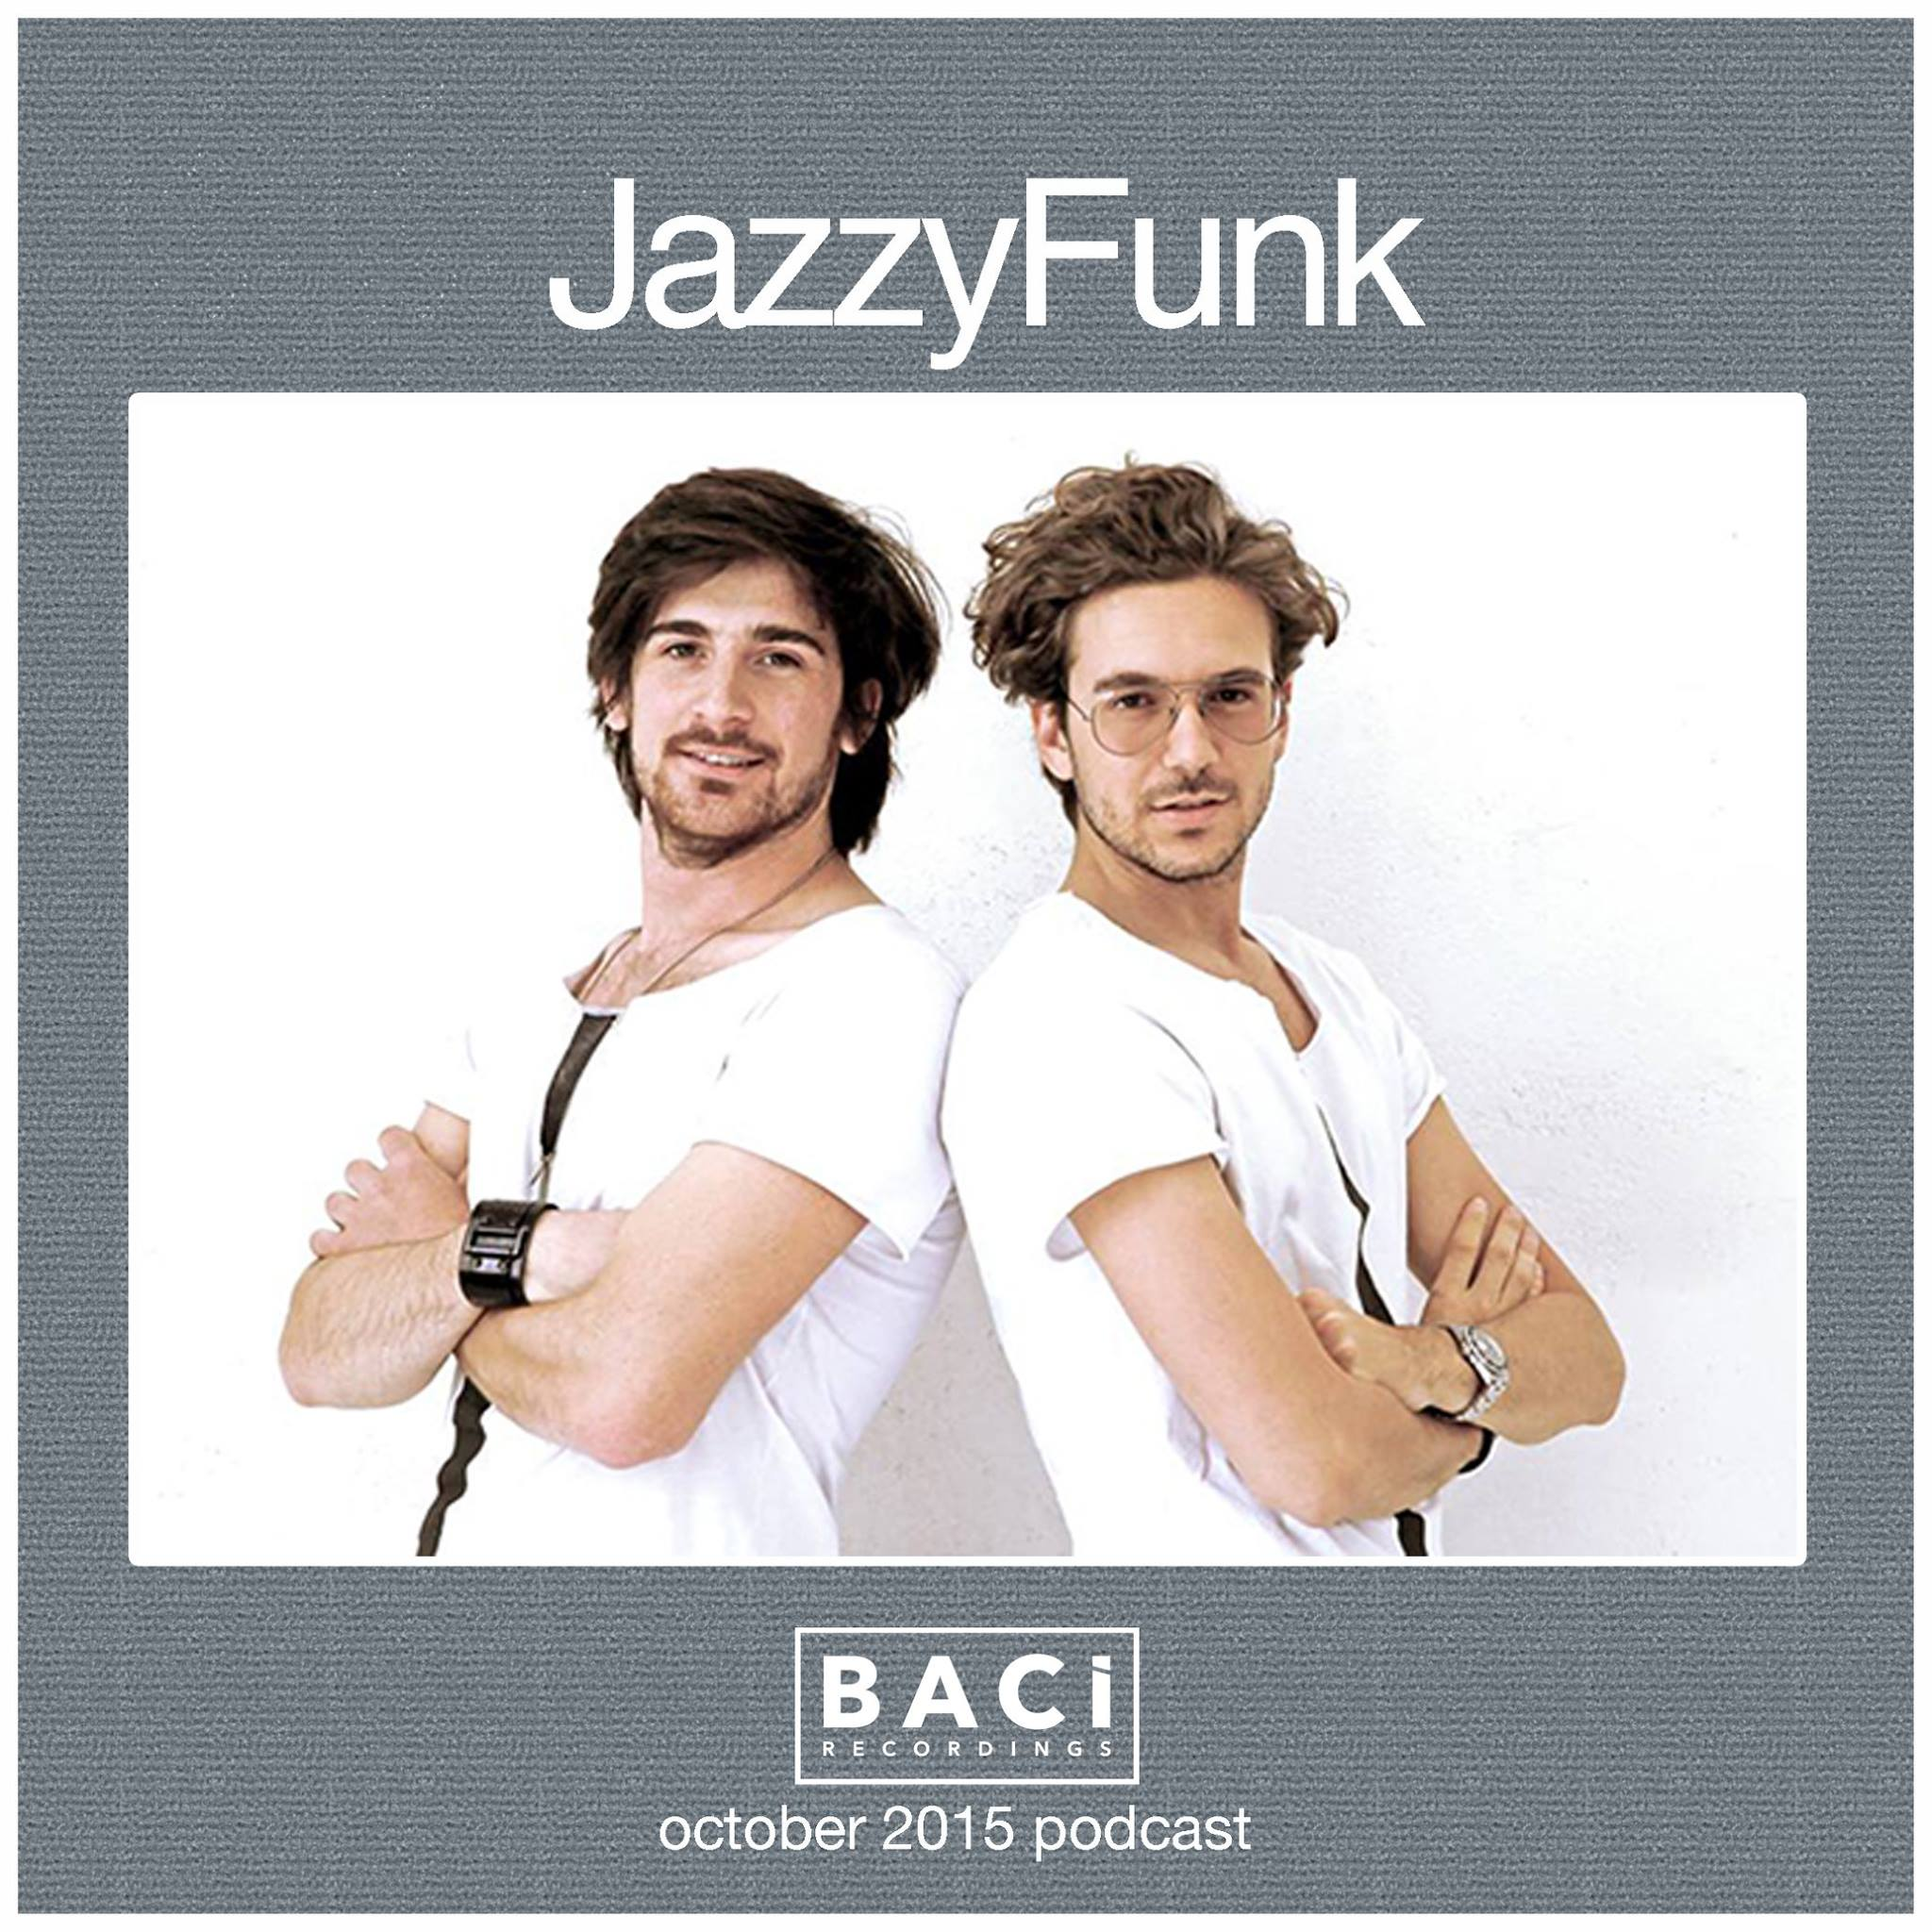 Baci Recordings / TUNNEL FM